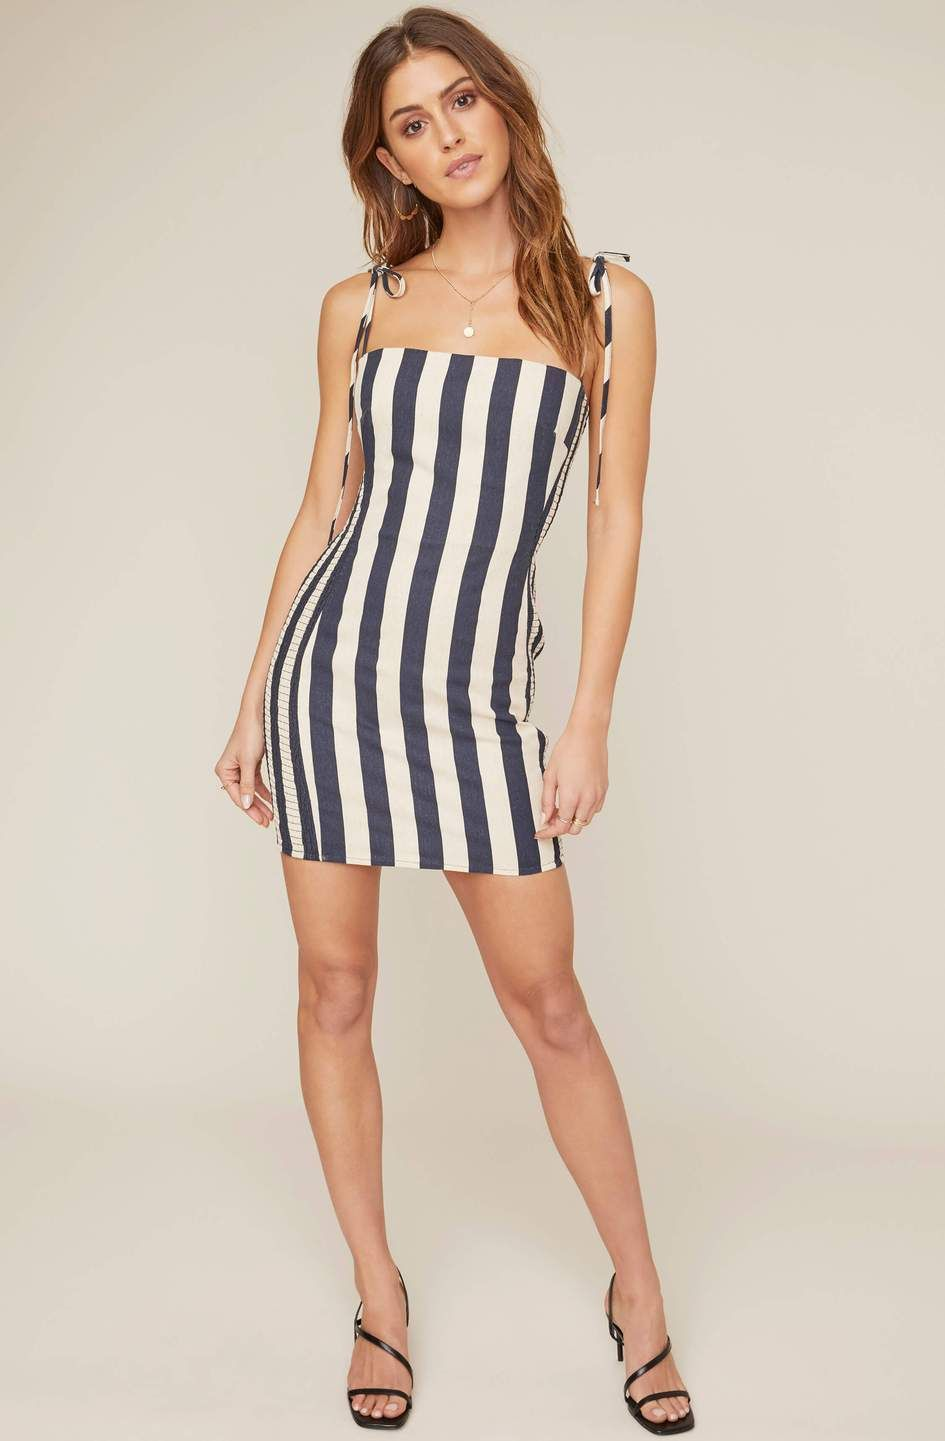 Lena Striped Bodycon Dress Hemline Striped Bodycon Dress Bodycon Dress Dresses [ 1441 x 945 Pixel ]